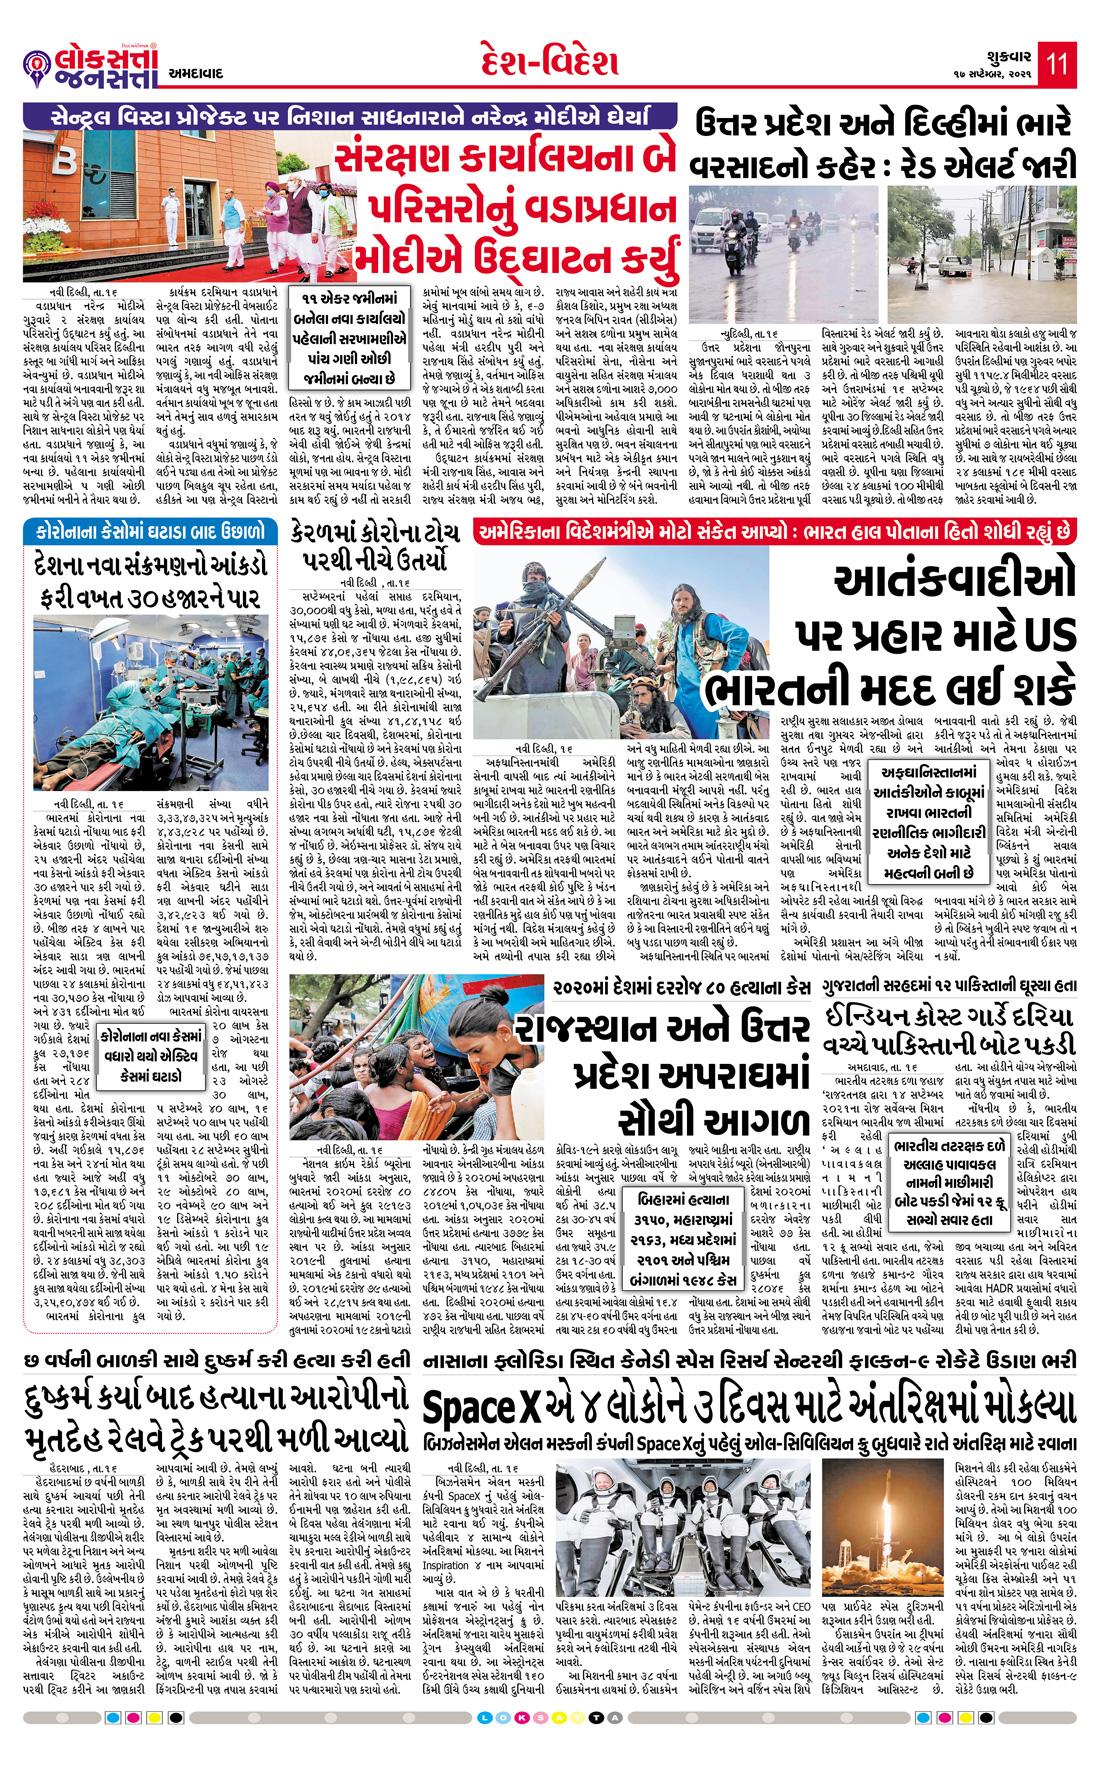 Loksatta Jansatta News Papaer E-paper dated 2021-09-17   Page 11